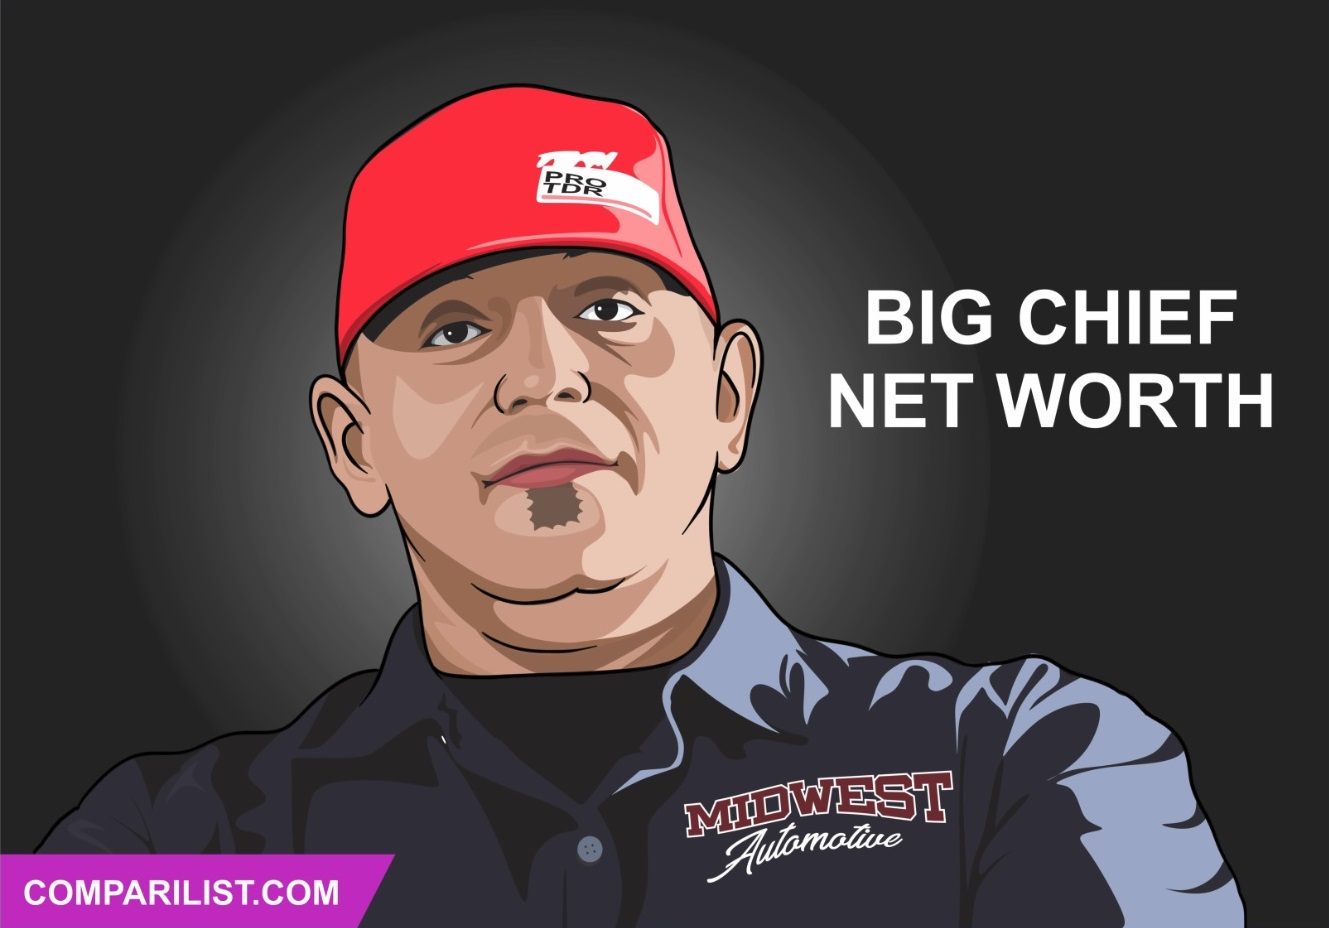 Big Chief